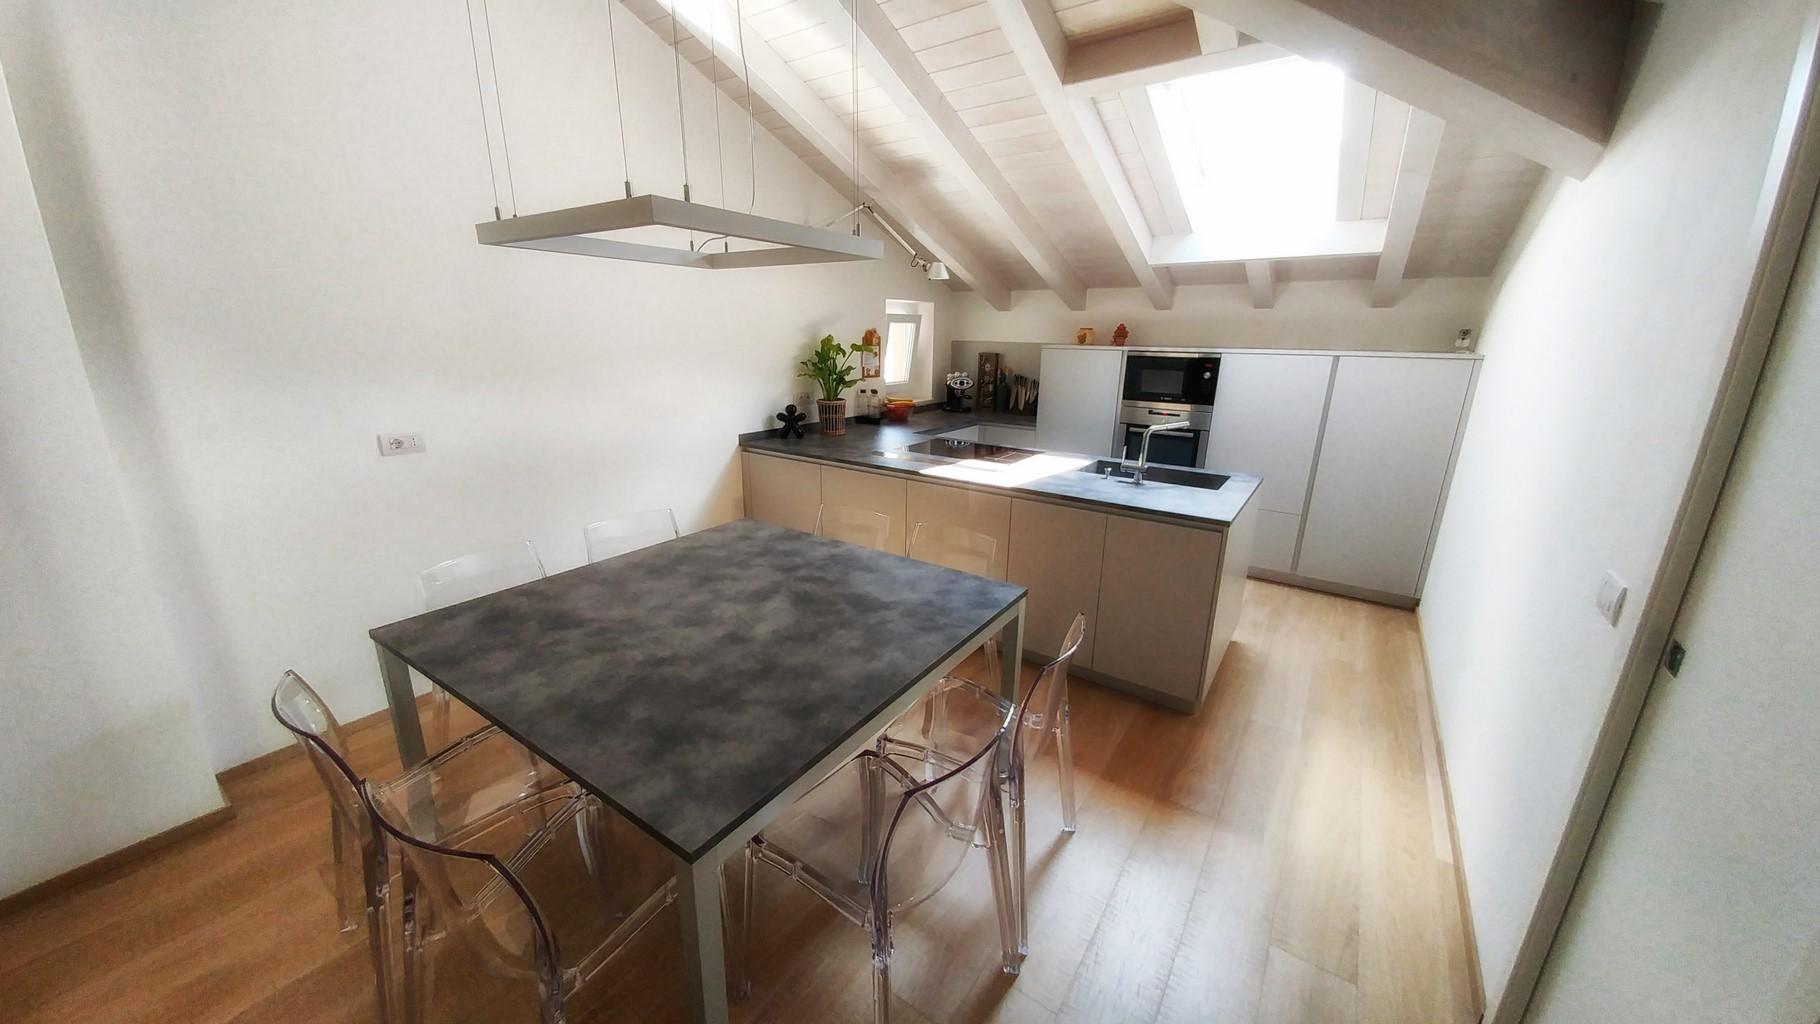 Una mansarda con tanta luce in cucina for Arredare con la luce